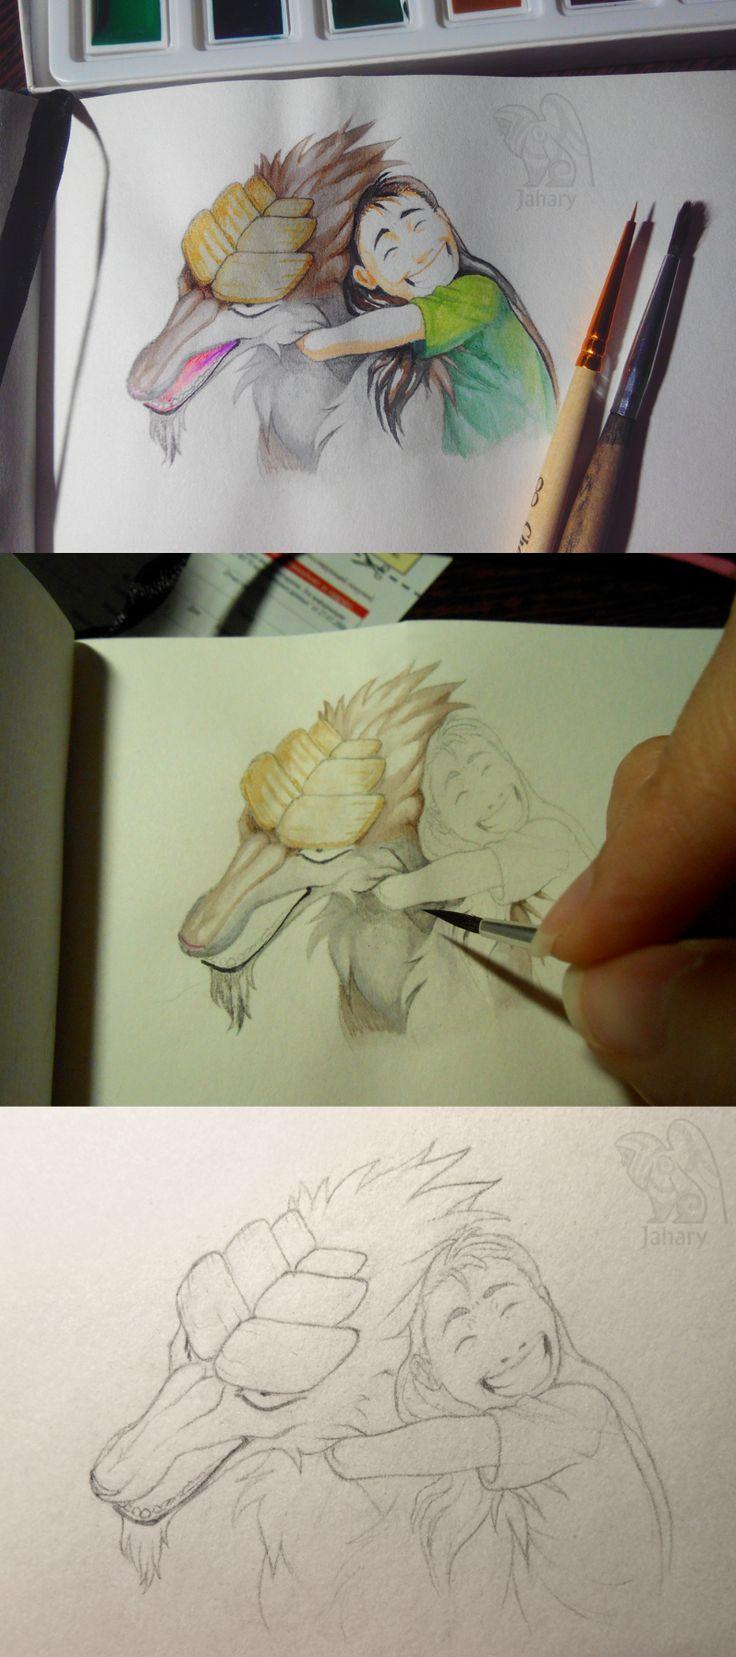 Watercolor in sketchbook